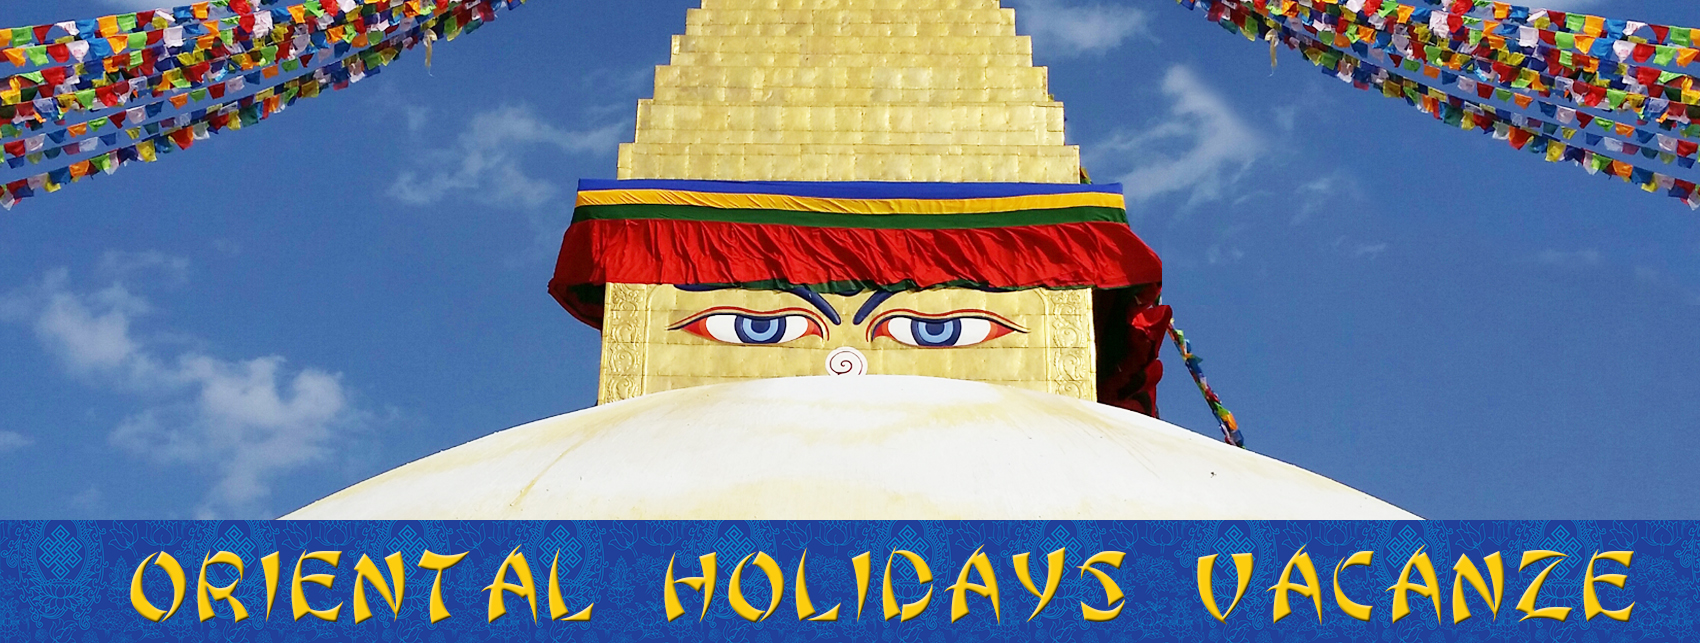 oriental holidays vacanze